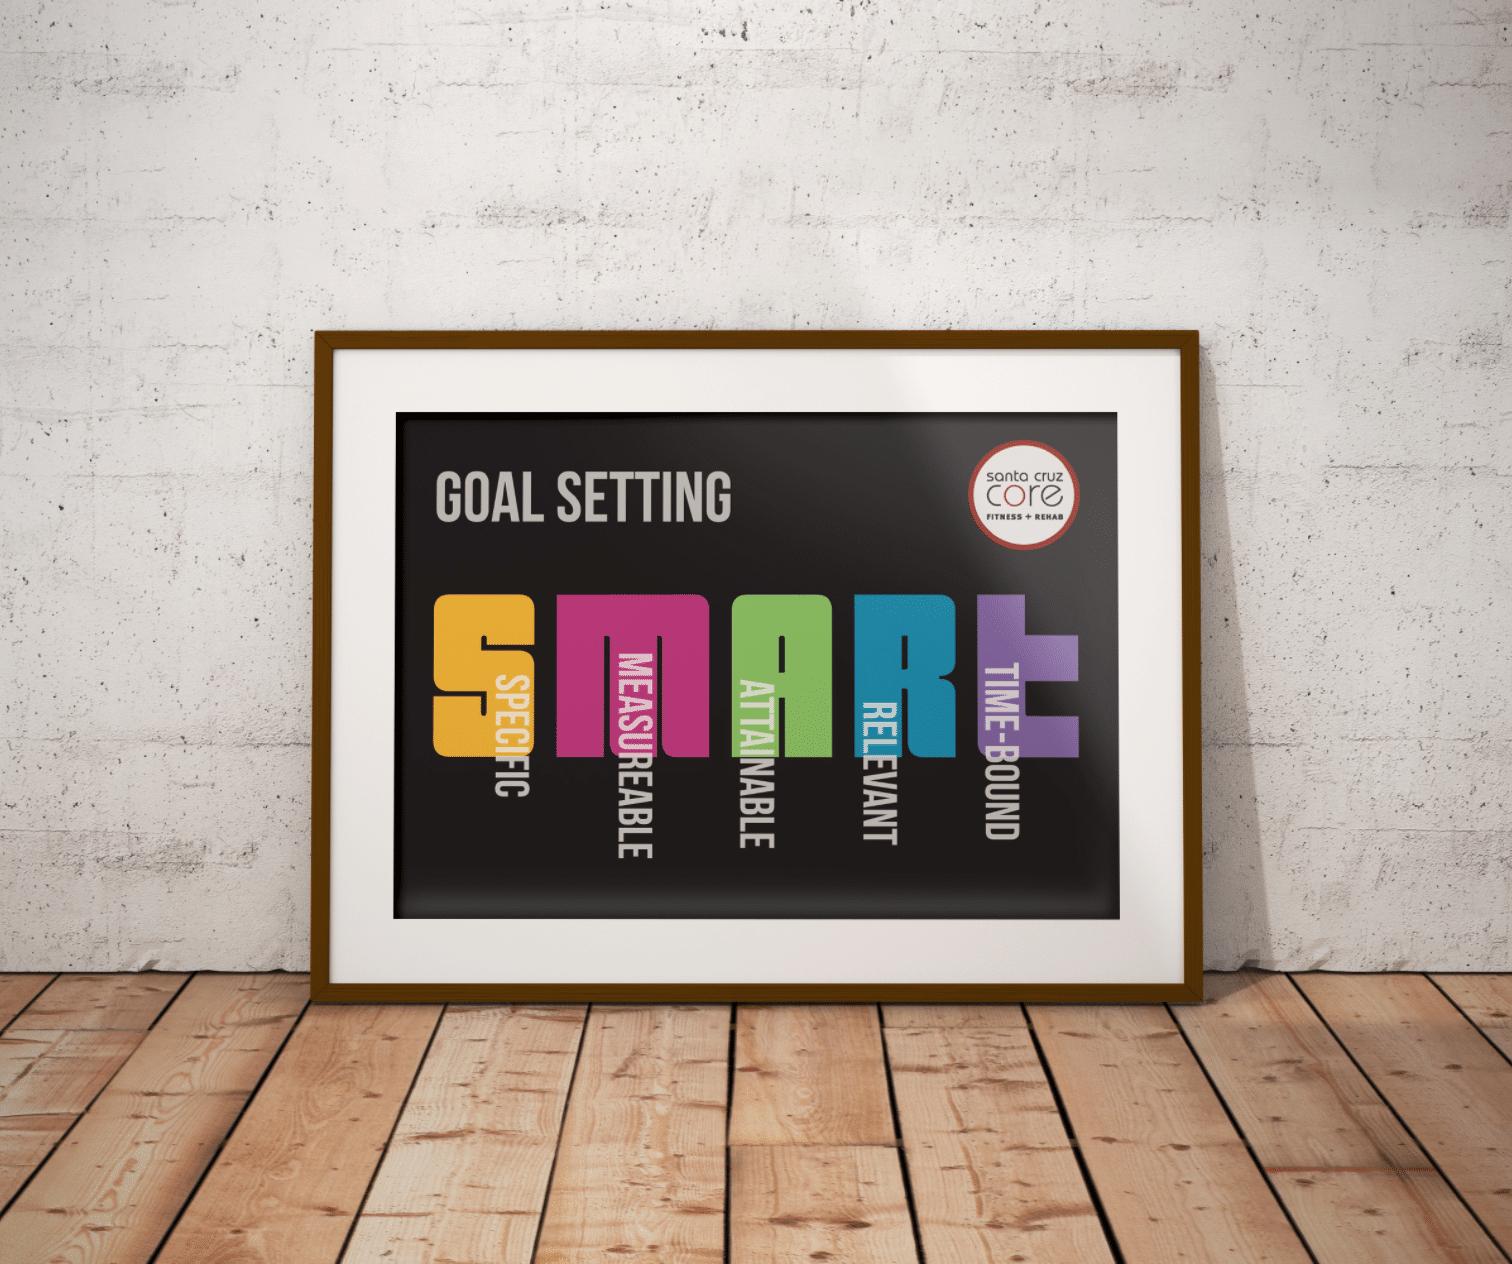 goal-setting-smart-poster-core